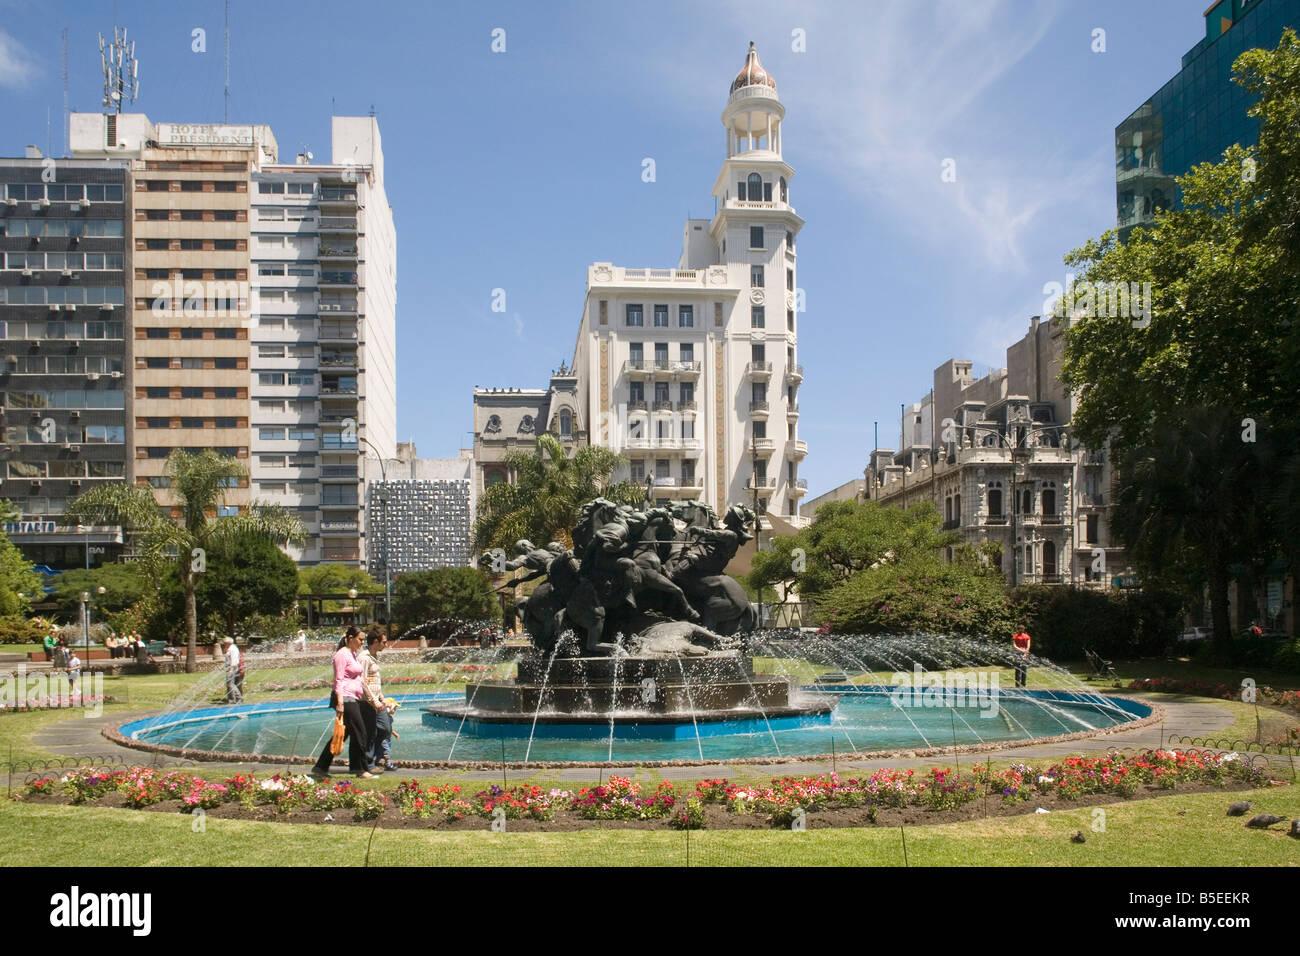 Plaza Fabini Montevideo Uruguay South America Stock Photo